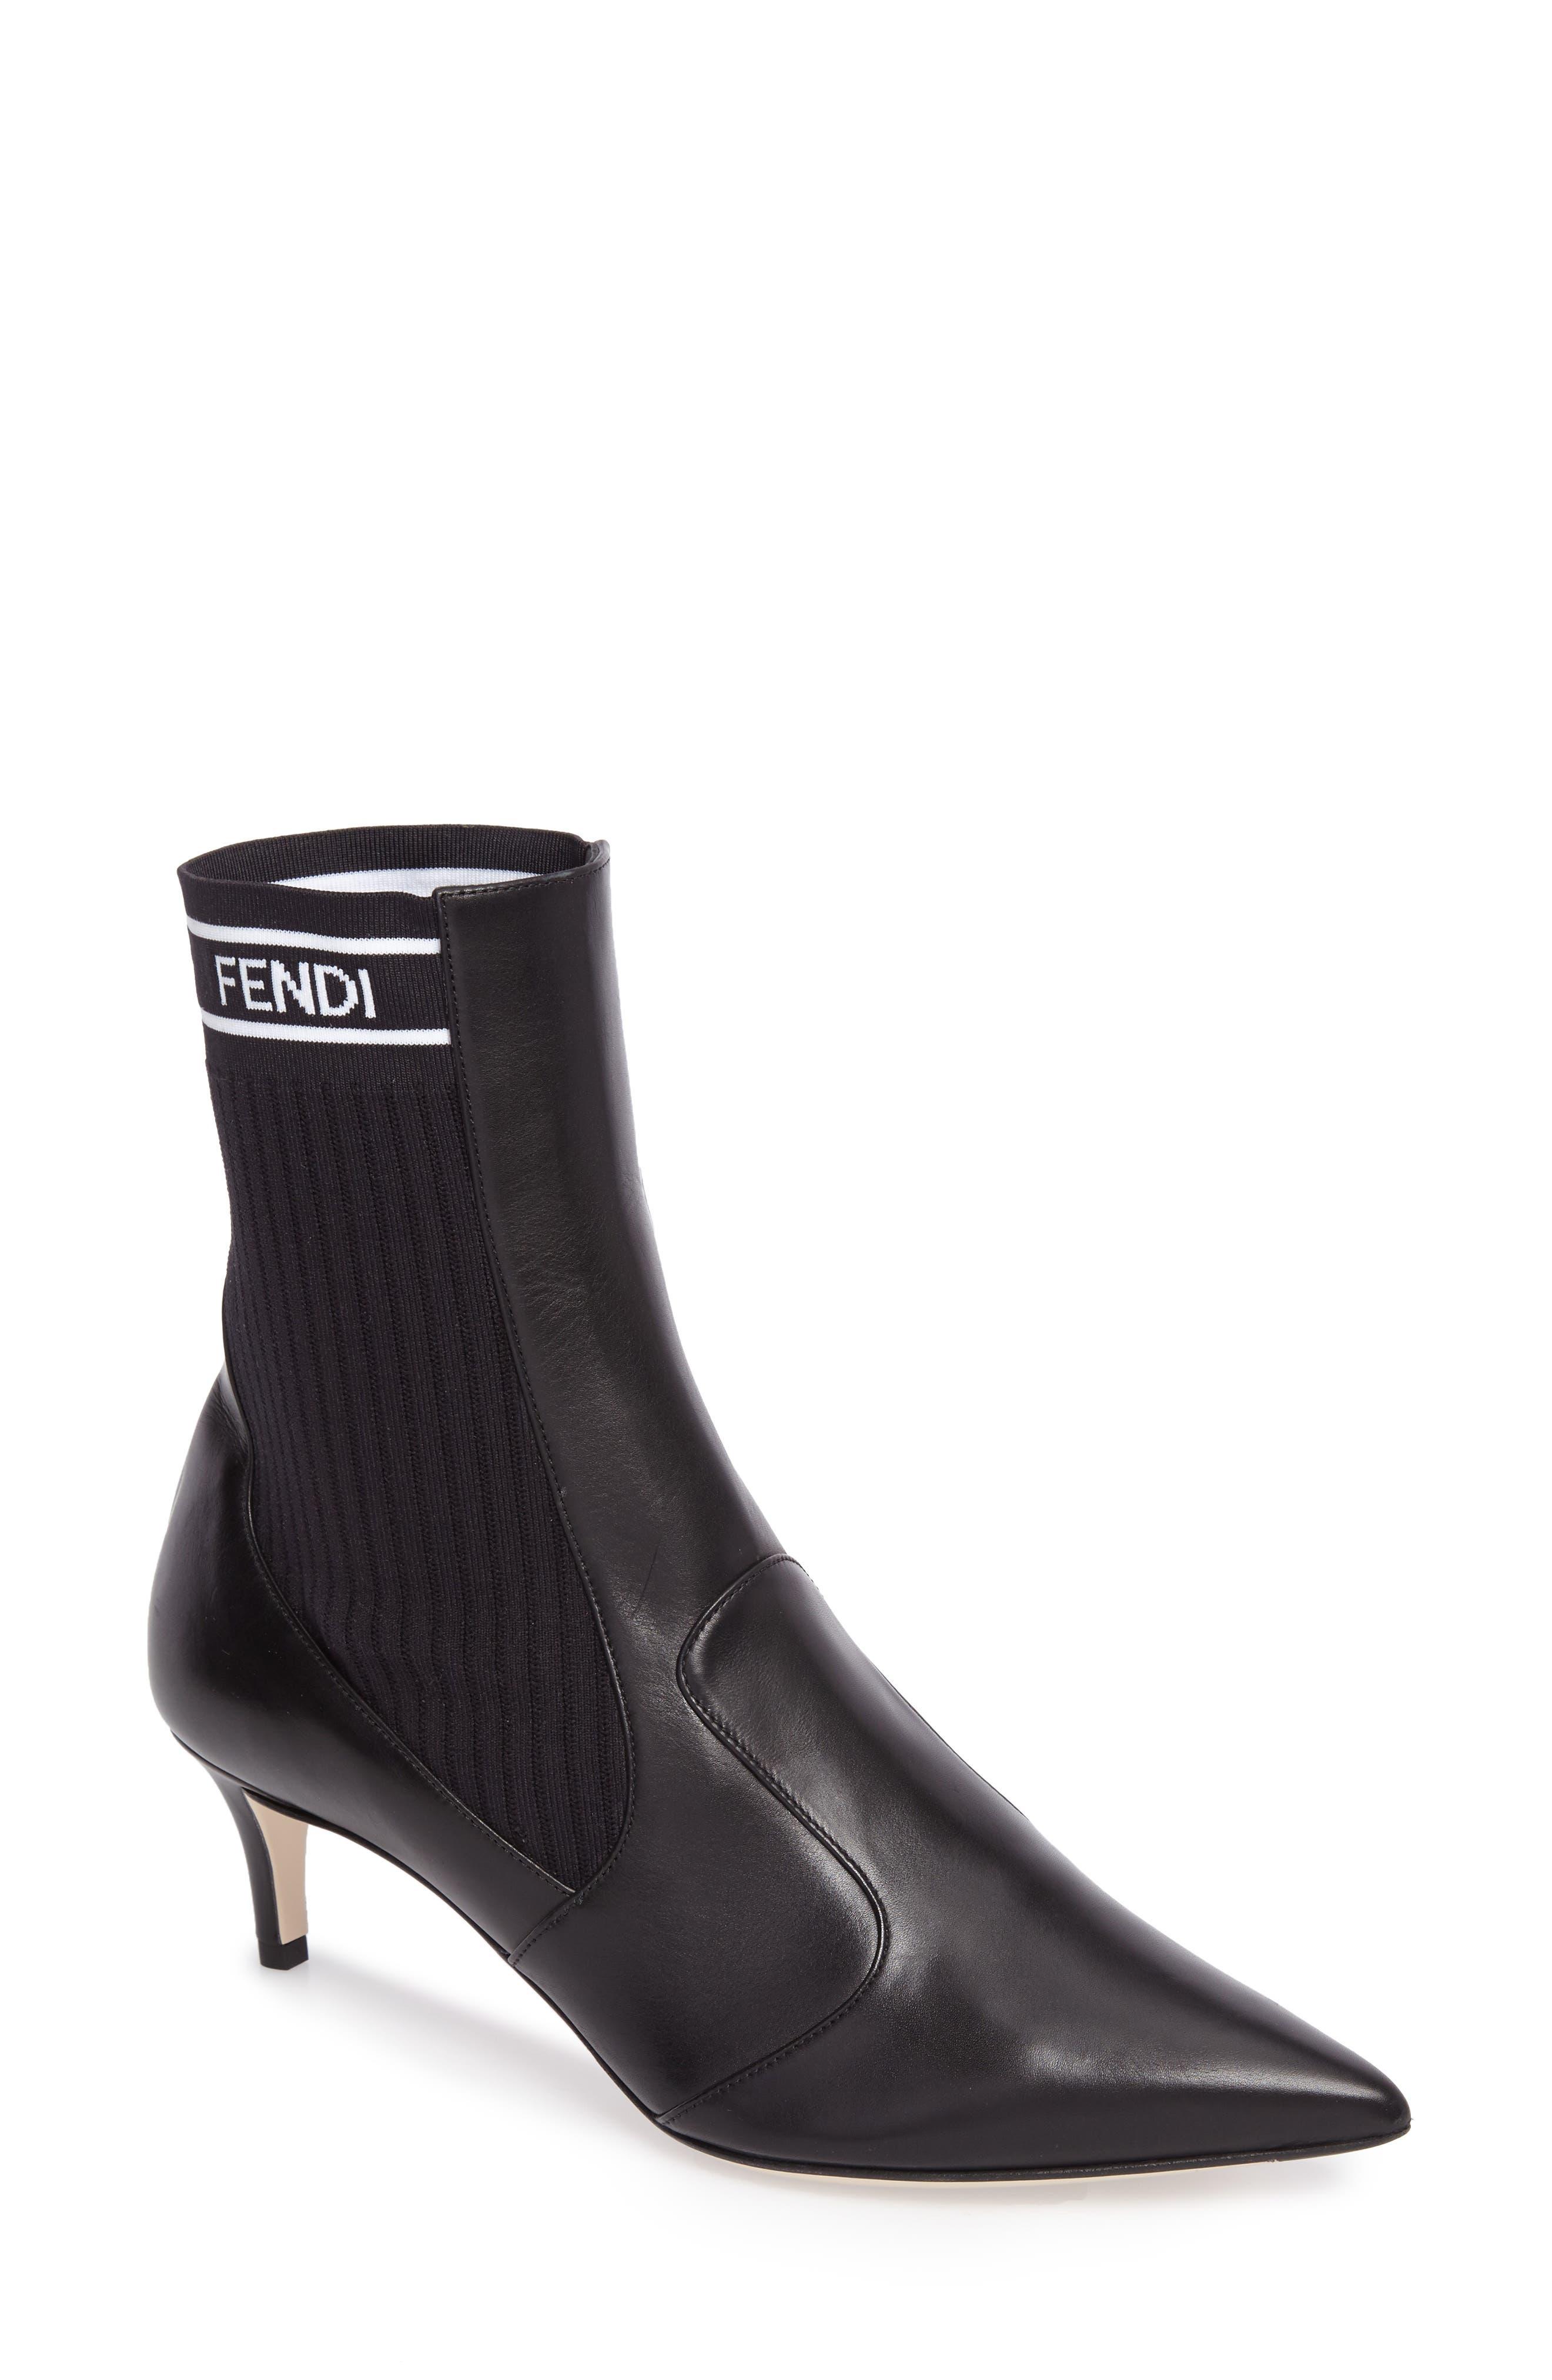 Main Image - Fendi Rockoko Chelsea Sock Boot (Women)